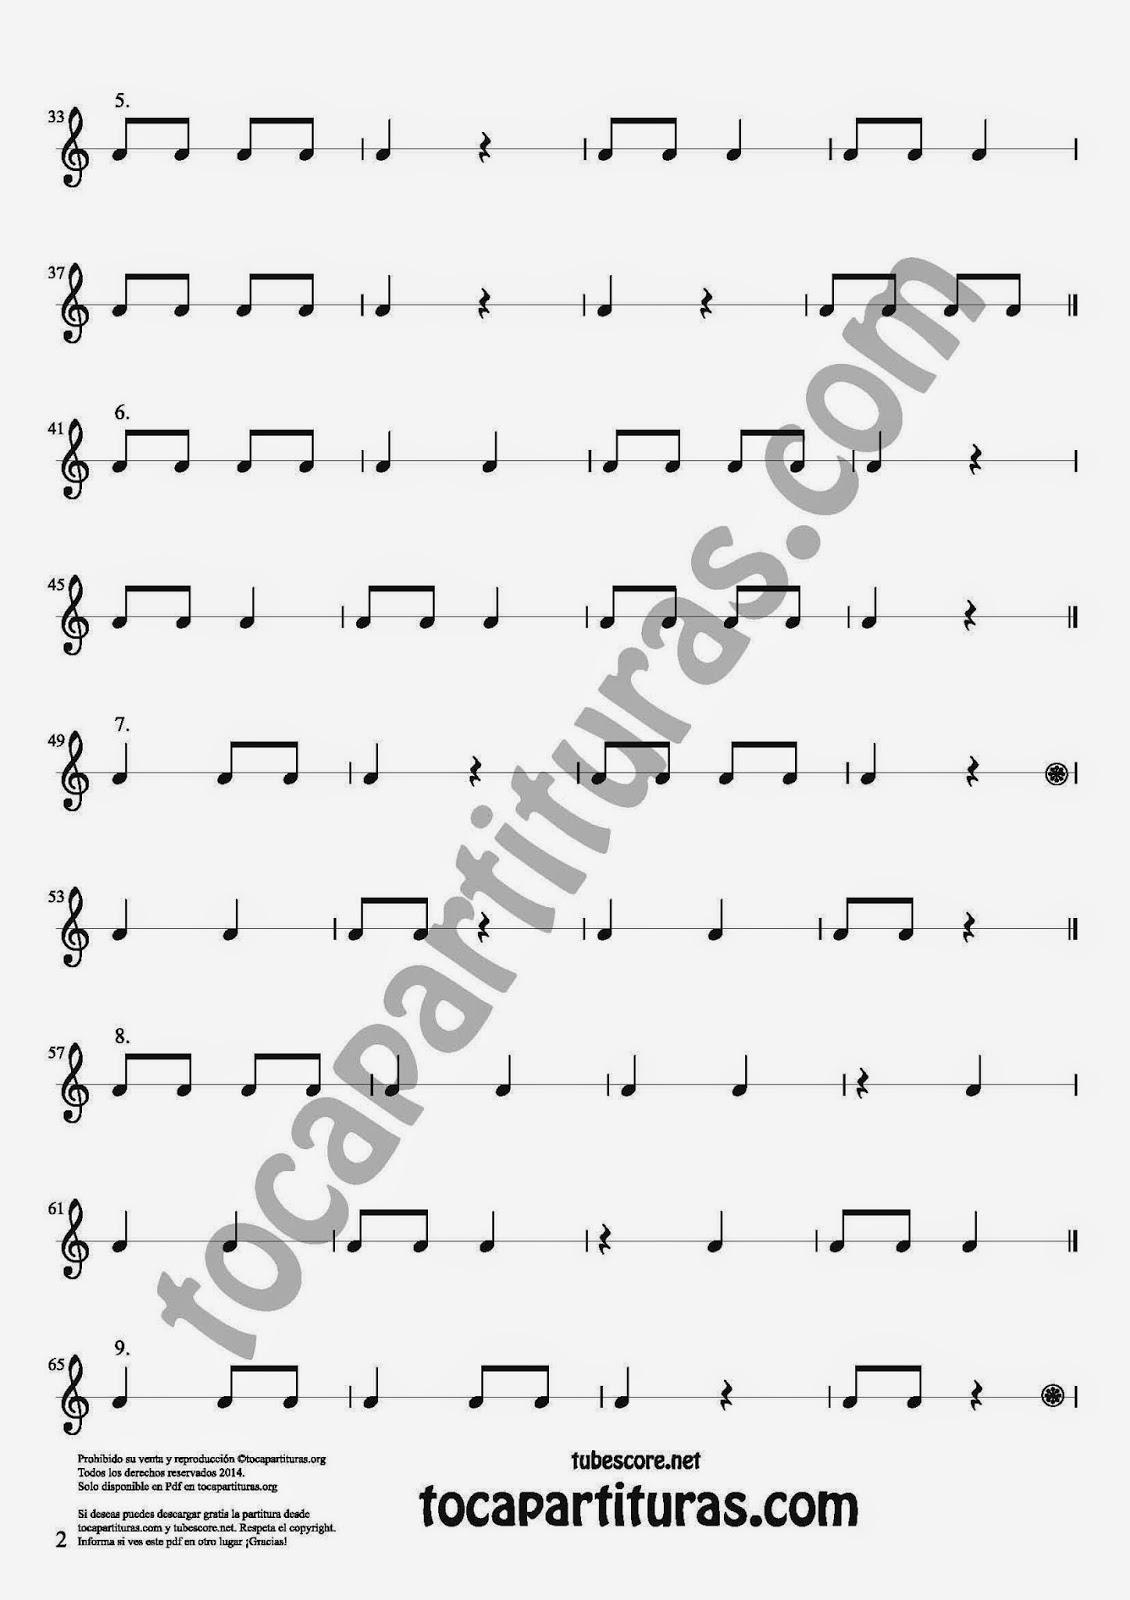 2 27 Ejercicios Rítmicos para Aprener Solfeo en el Compás de 2/4 Aprender negras, corcheas, blancas y sus silencios. Easy Rithm Sheet Music for quarter notes, half notes, 1/8 notes and silences